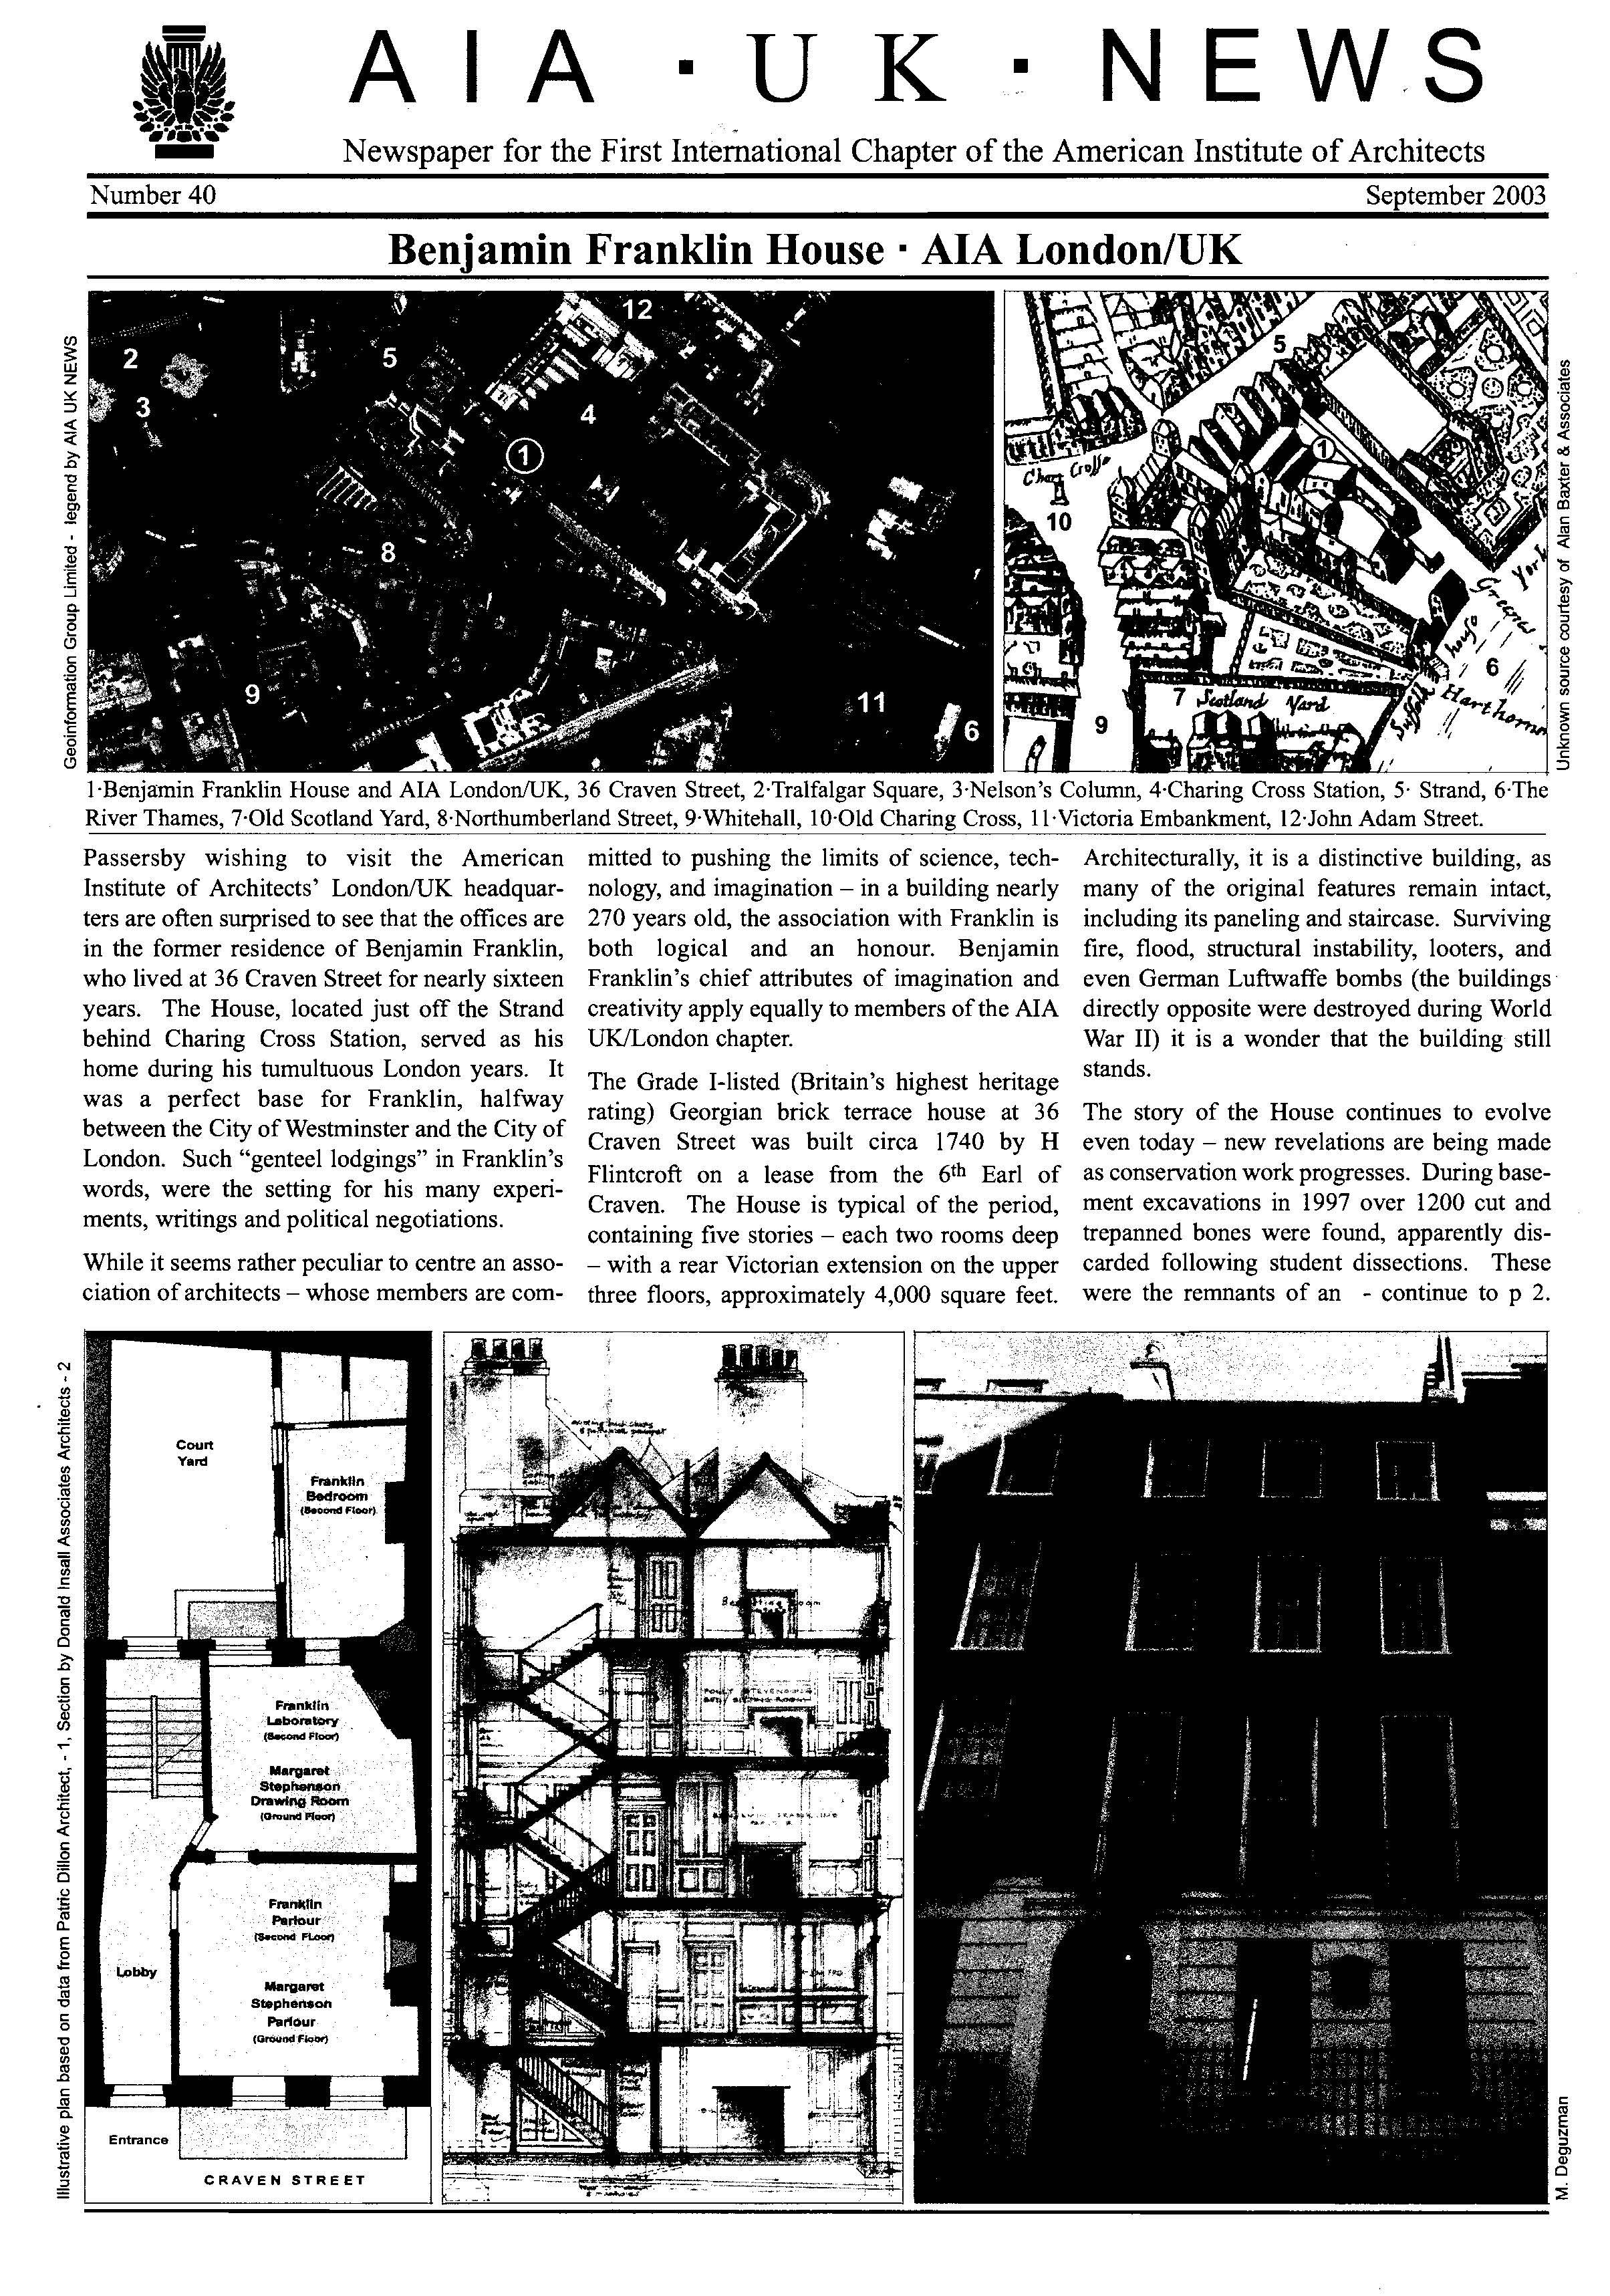 40 - September 2003 web_Page_1.jpg